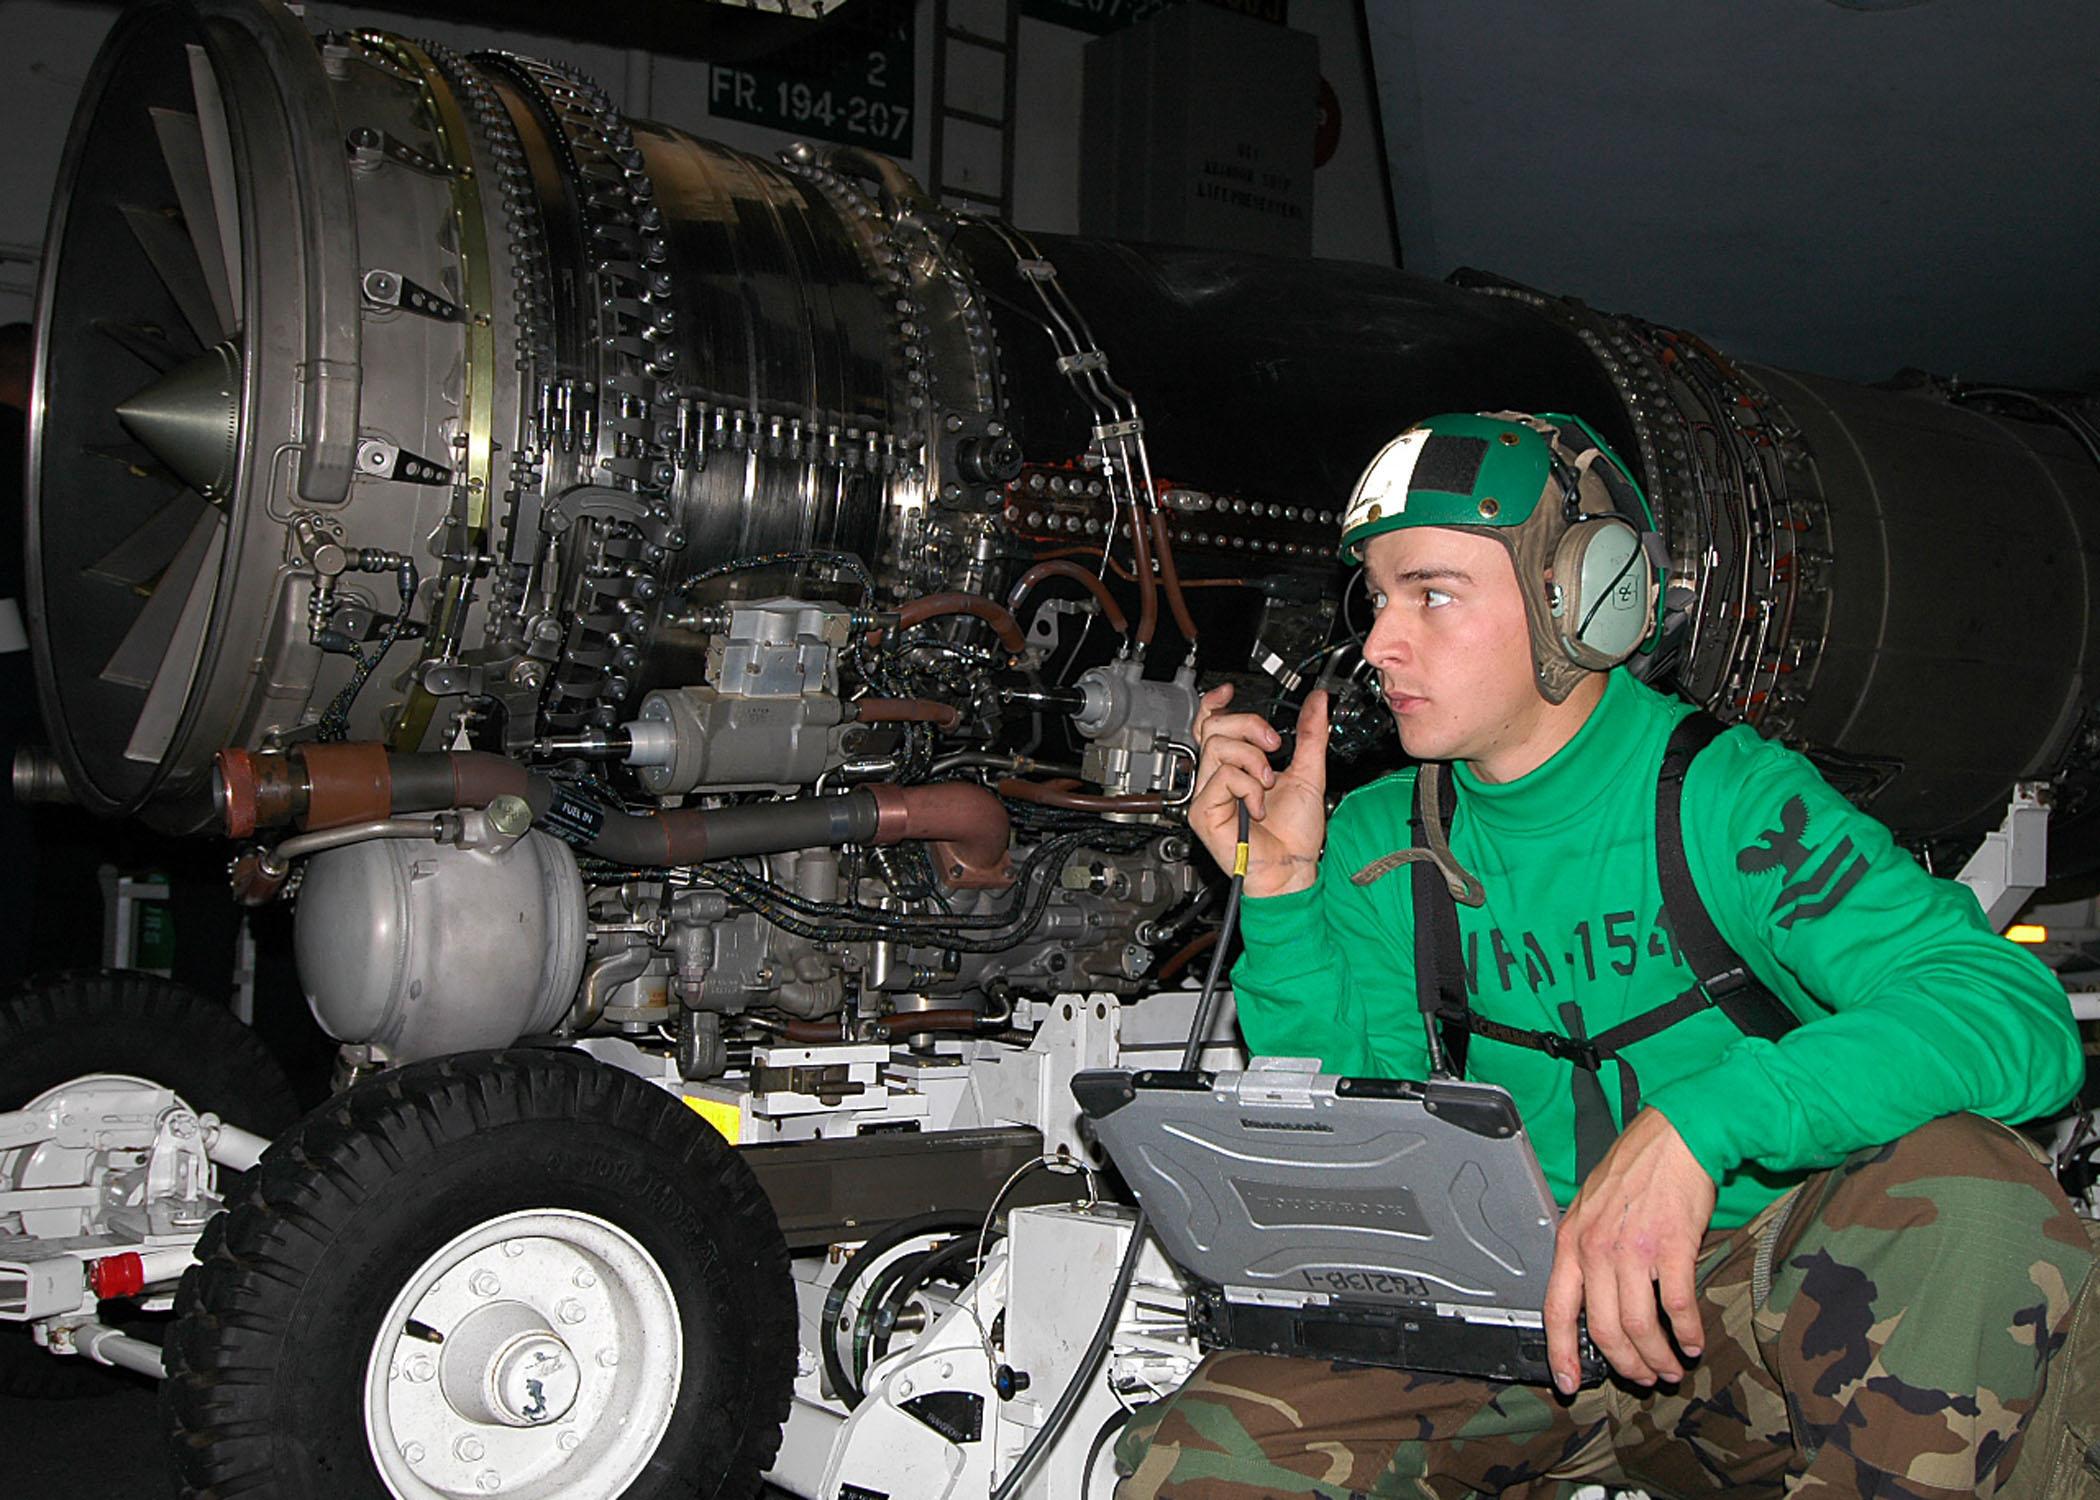 fileus navy 060627 n 5024r 001 aviation structural mechanic equipment 2nd class greg harman conducts a 600 hour periodic maintenance check on a jet engine turbine engine mechanic